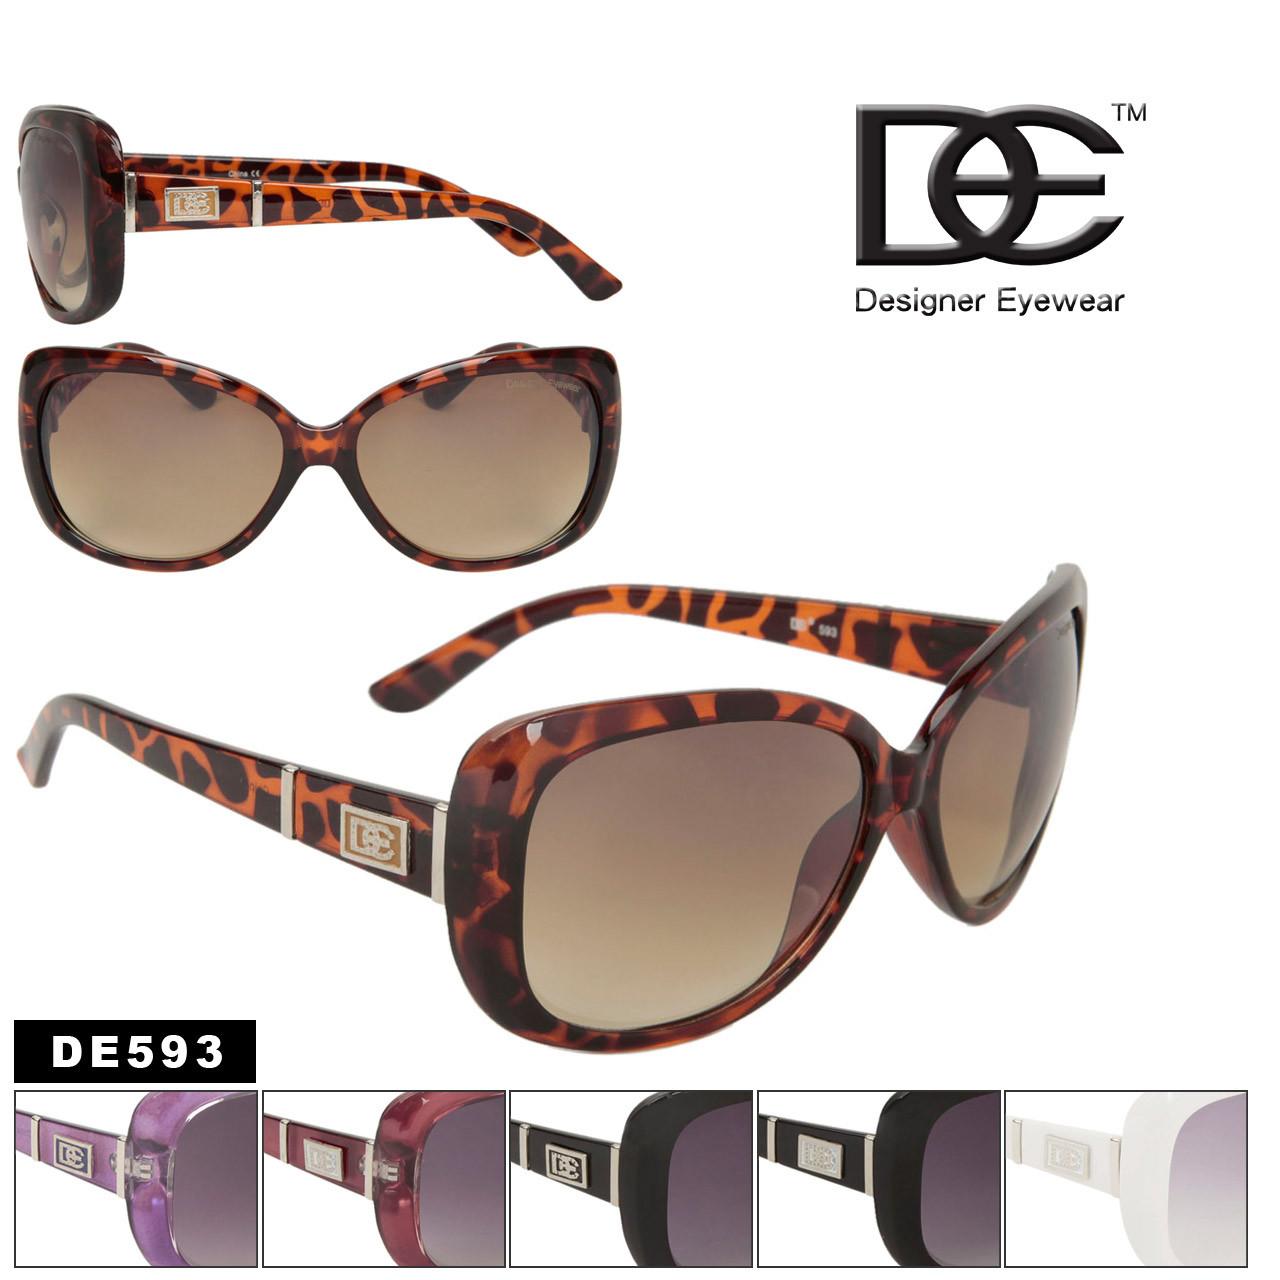 DE593 Designer Eyewear Fashion Sunglasses